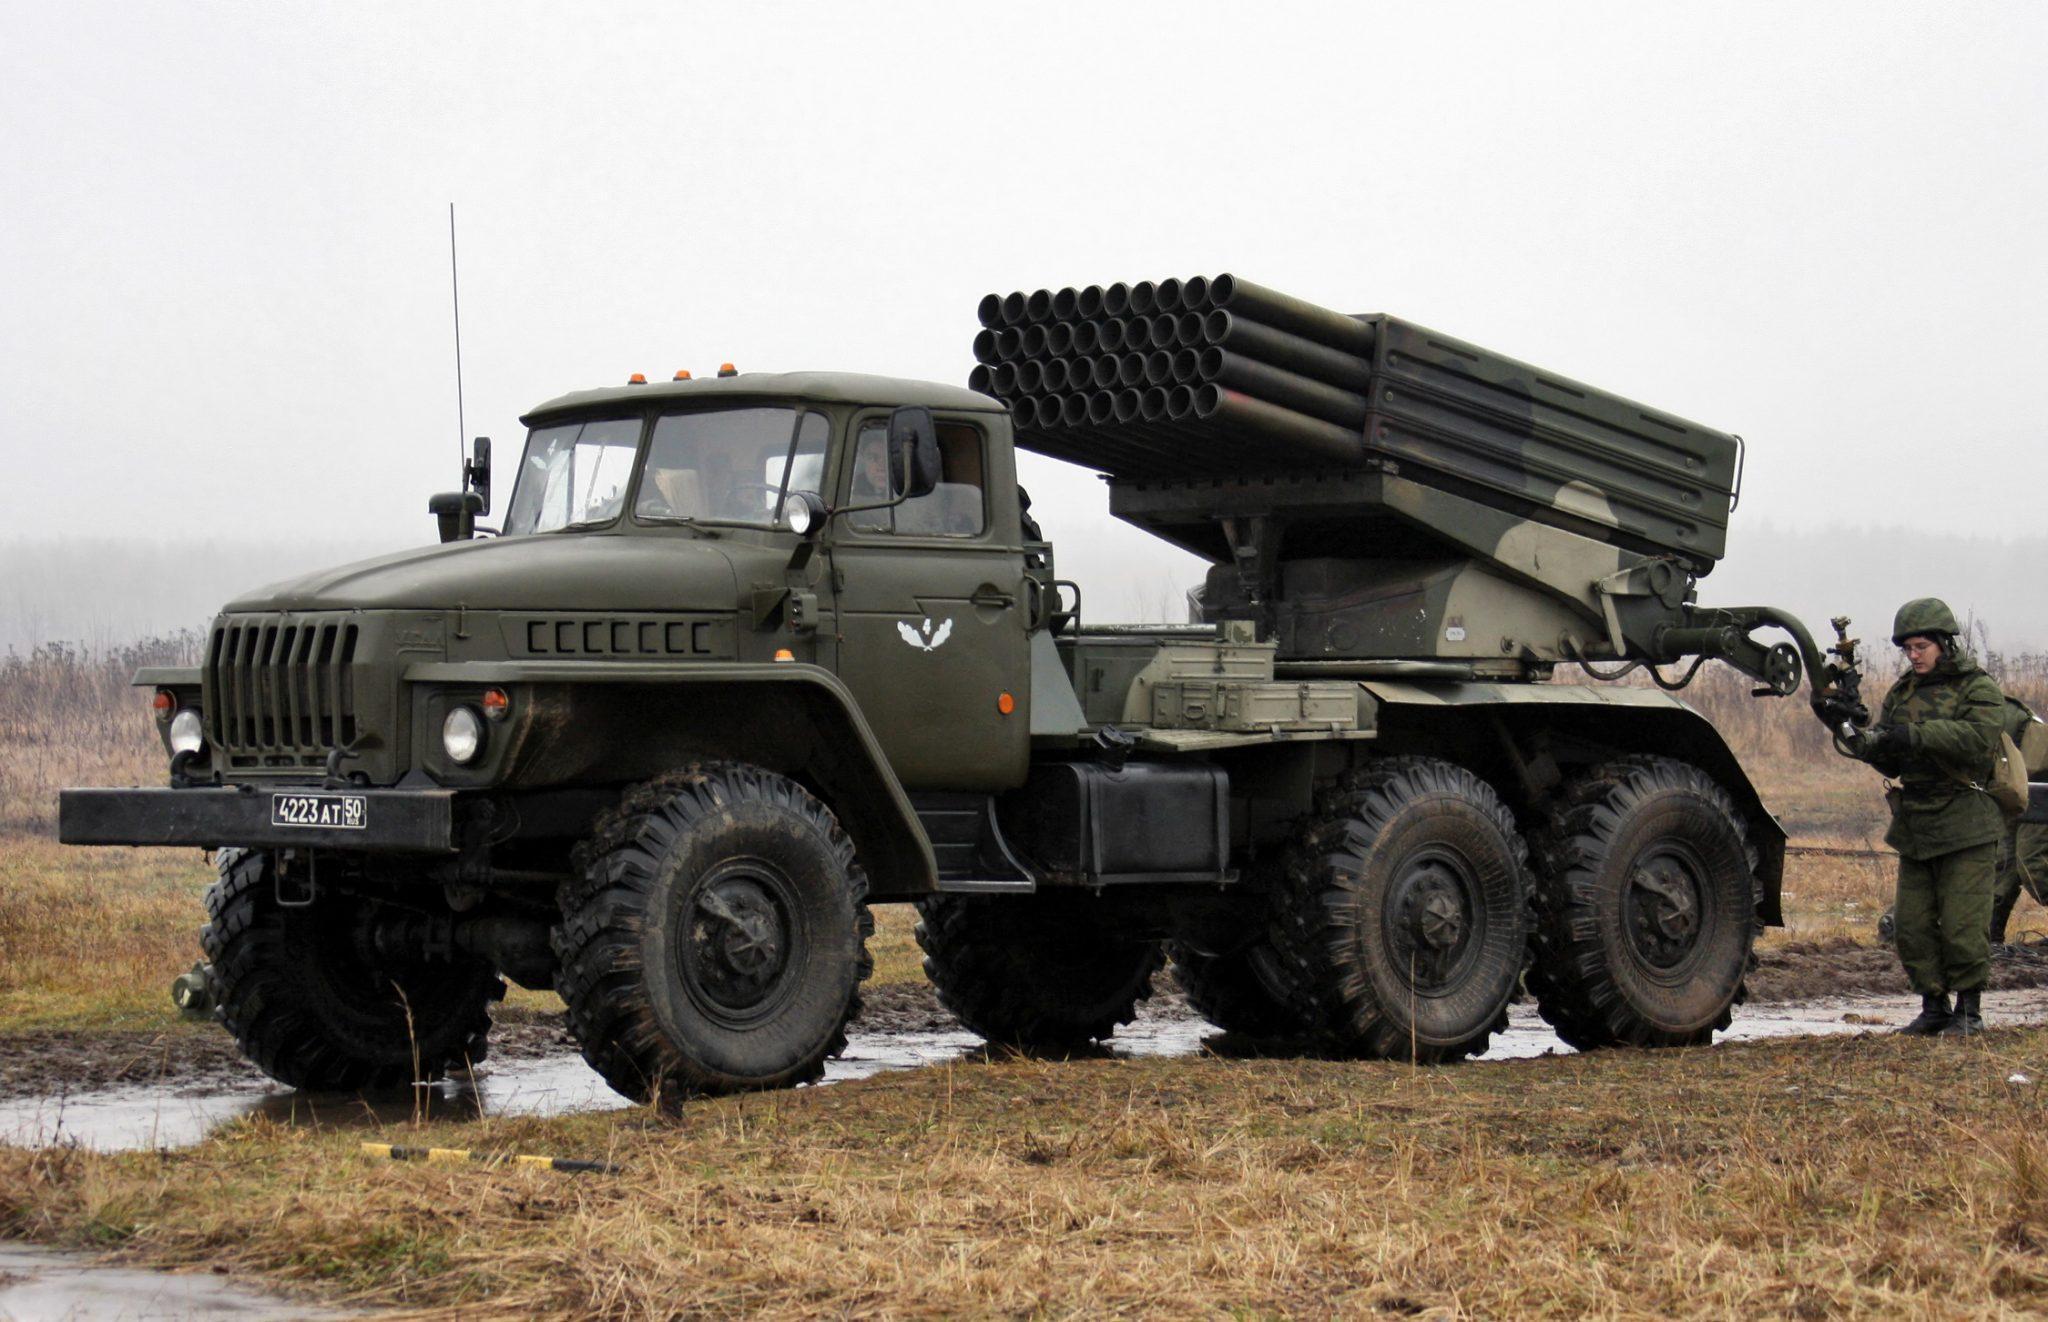 BM-21 Grad is still in service, despite it was introduced in service in 1963